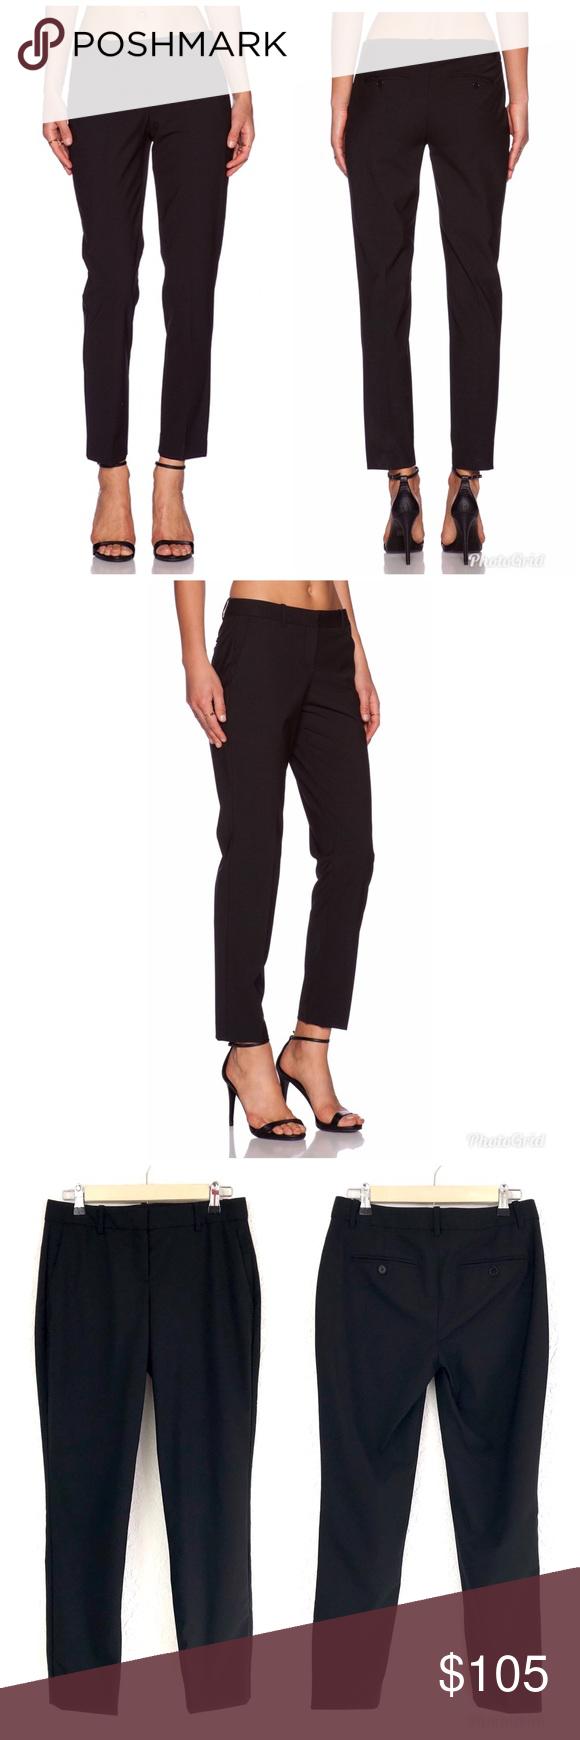 aeb1f06032a THEORY Testra 2B Black Wool Straight Leg Crop Pant Theory women's 'Testra  2B' classic